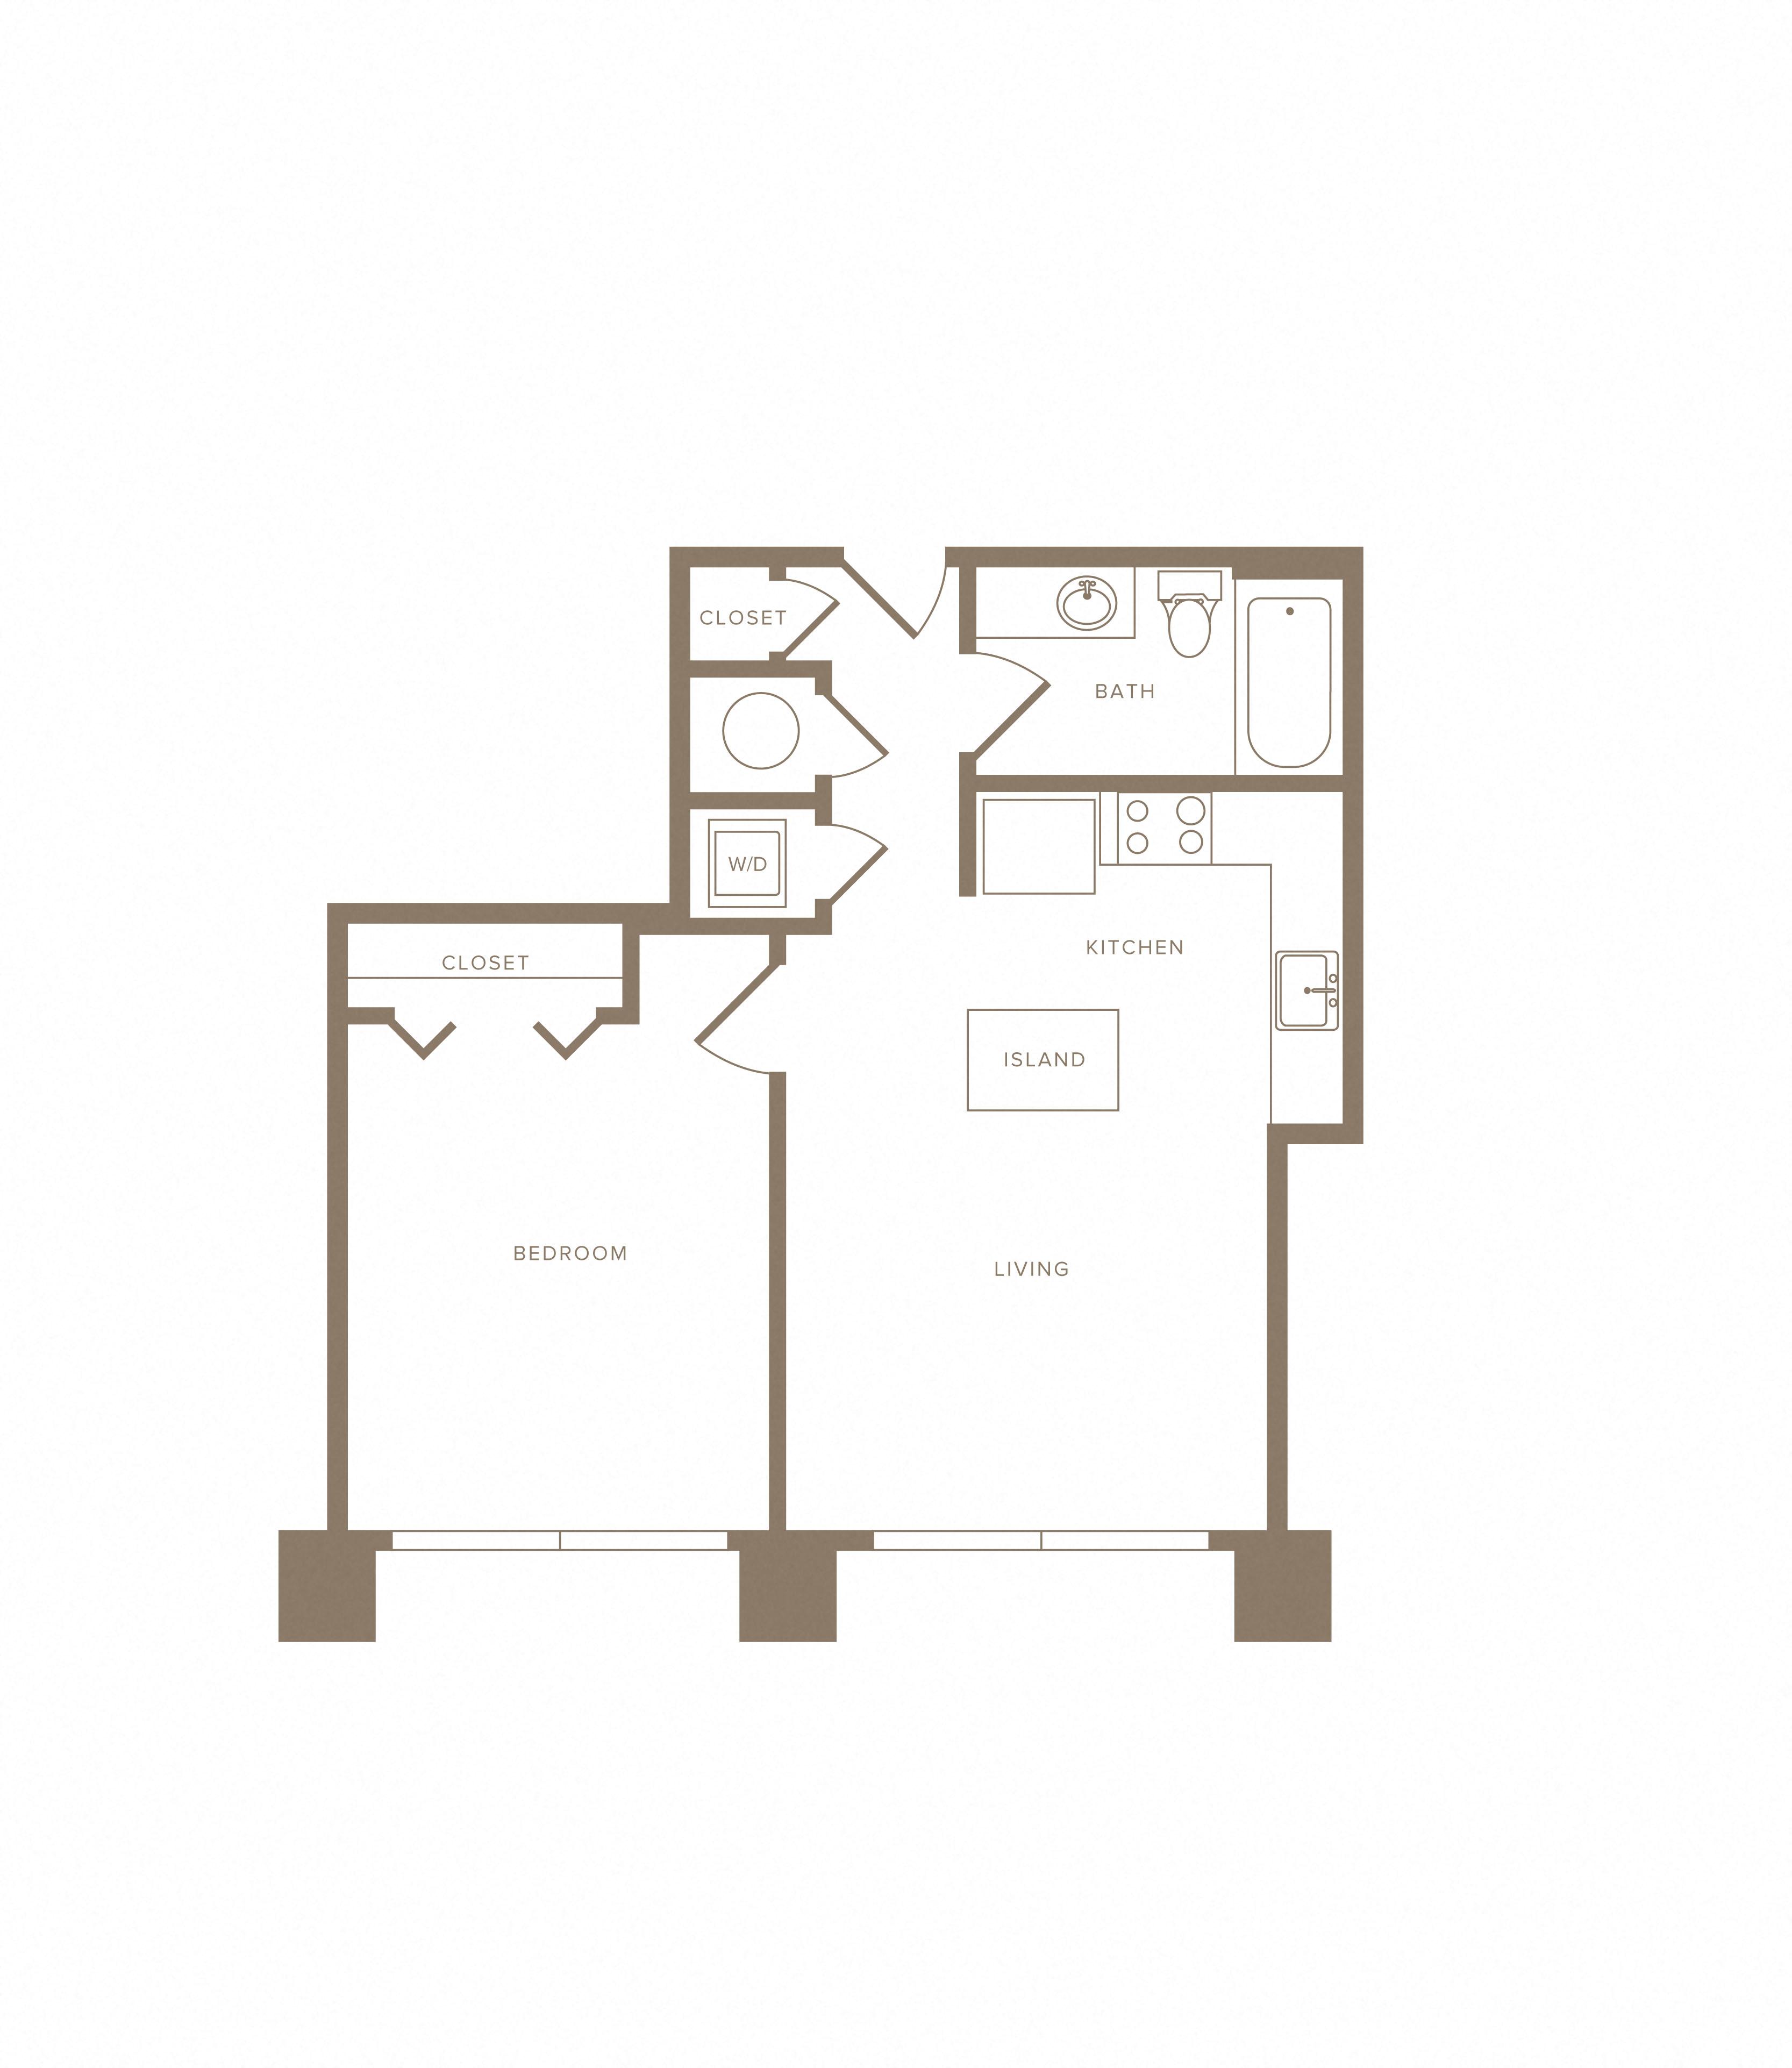 Apartment B-101 floorplan